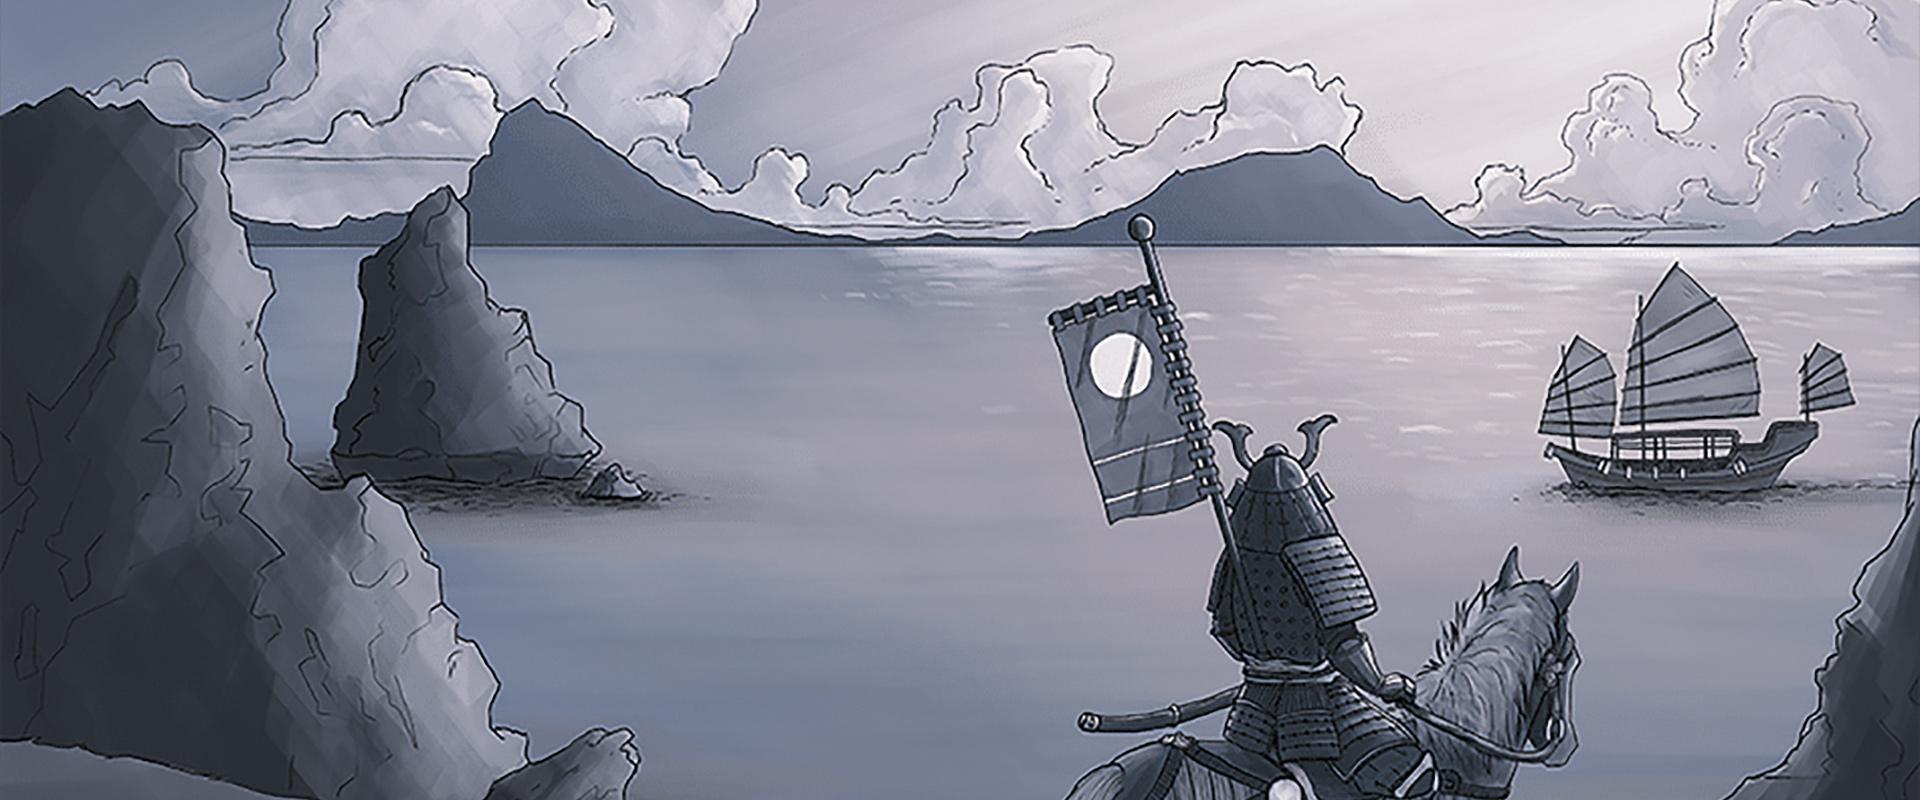 EPAC Illustration